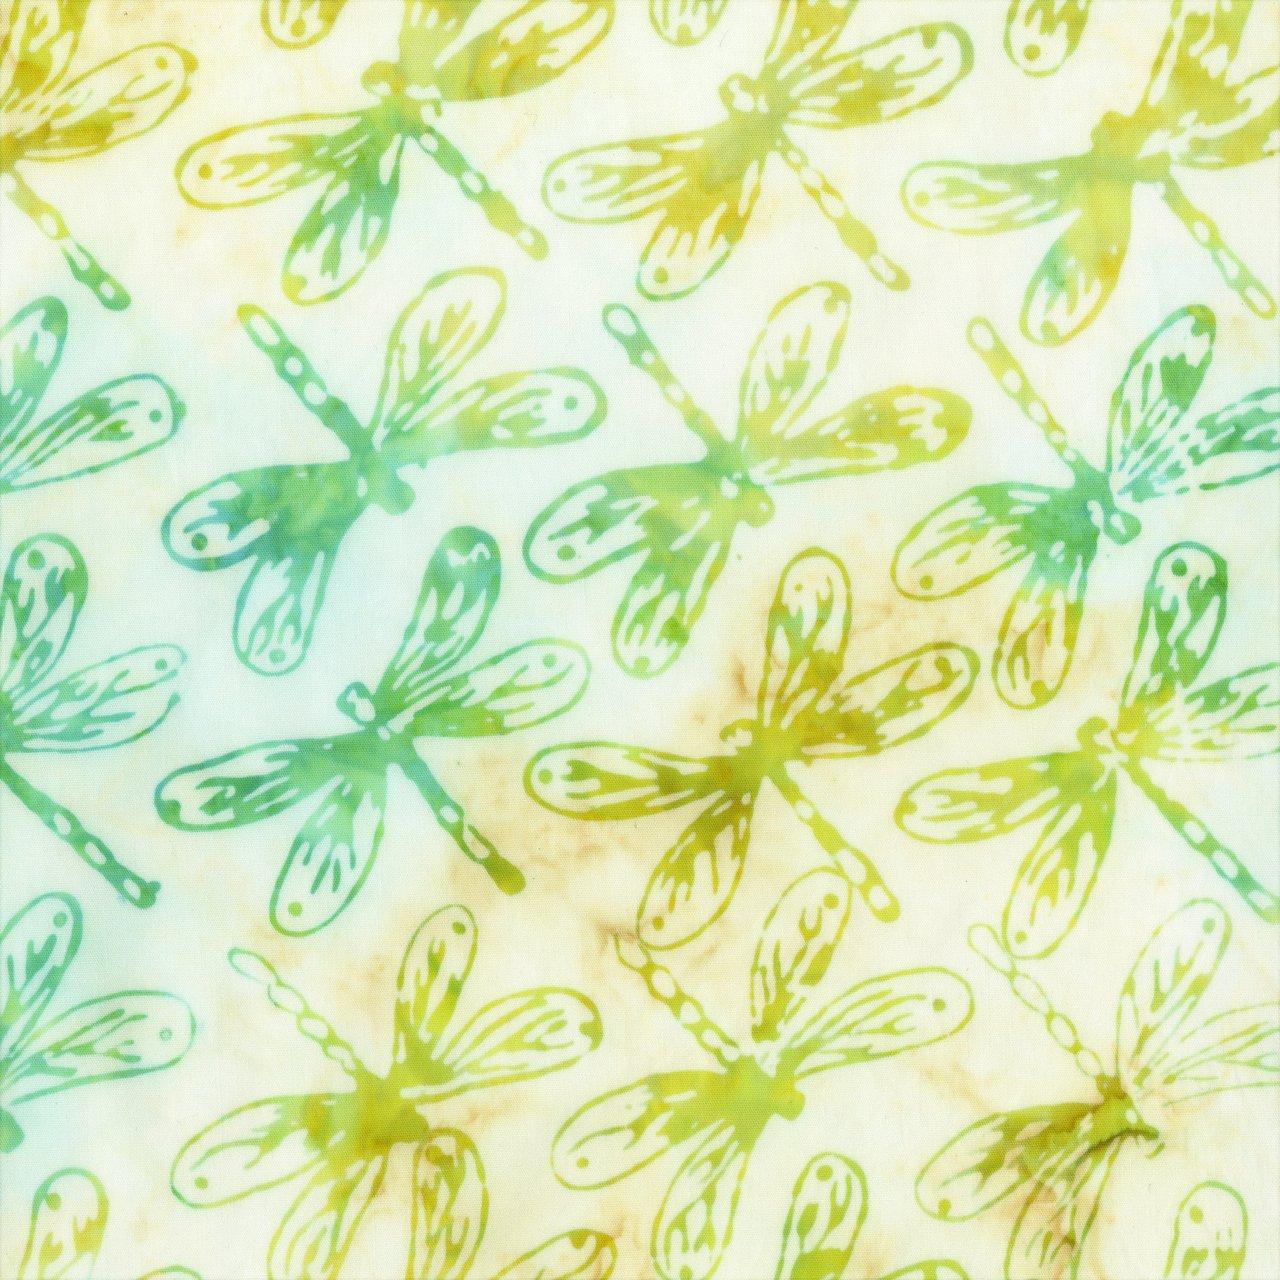 ANTH- Green Dragonflies on Lemon Batik